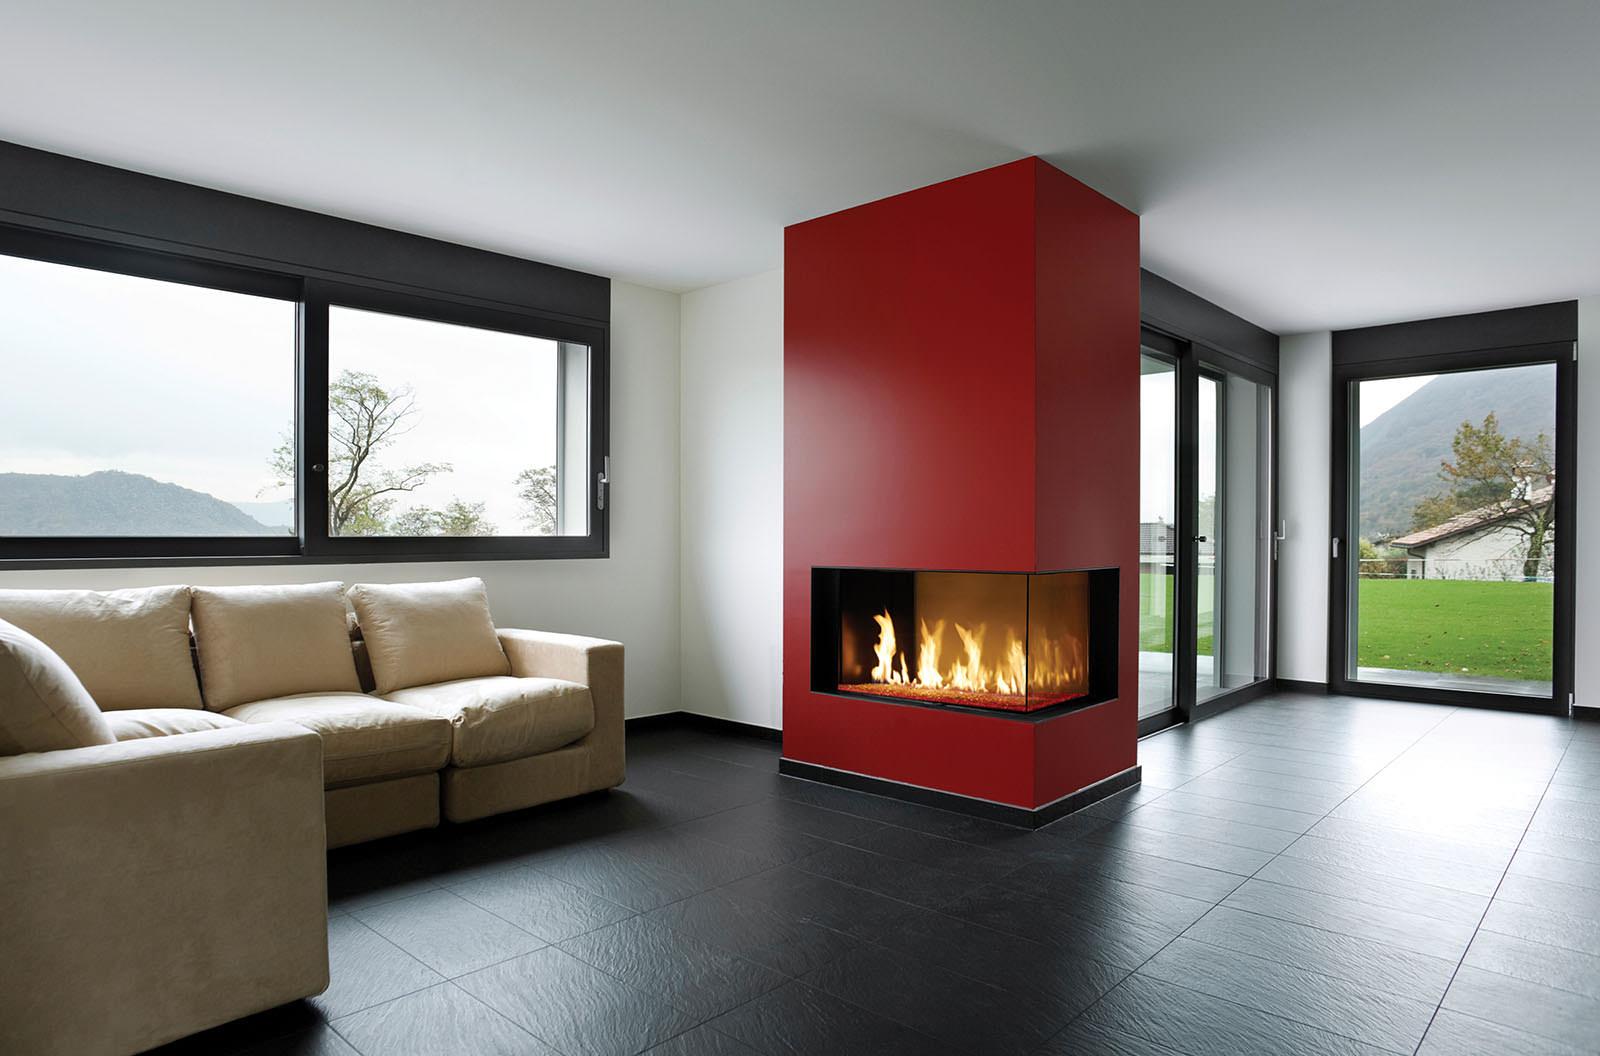 Davinci Gas Fireplace Right Corner 54x20 109143